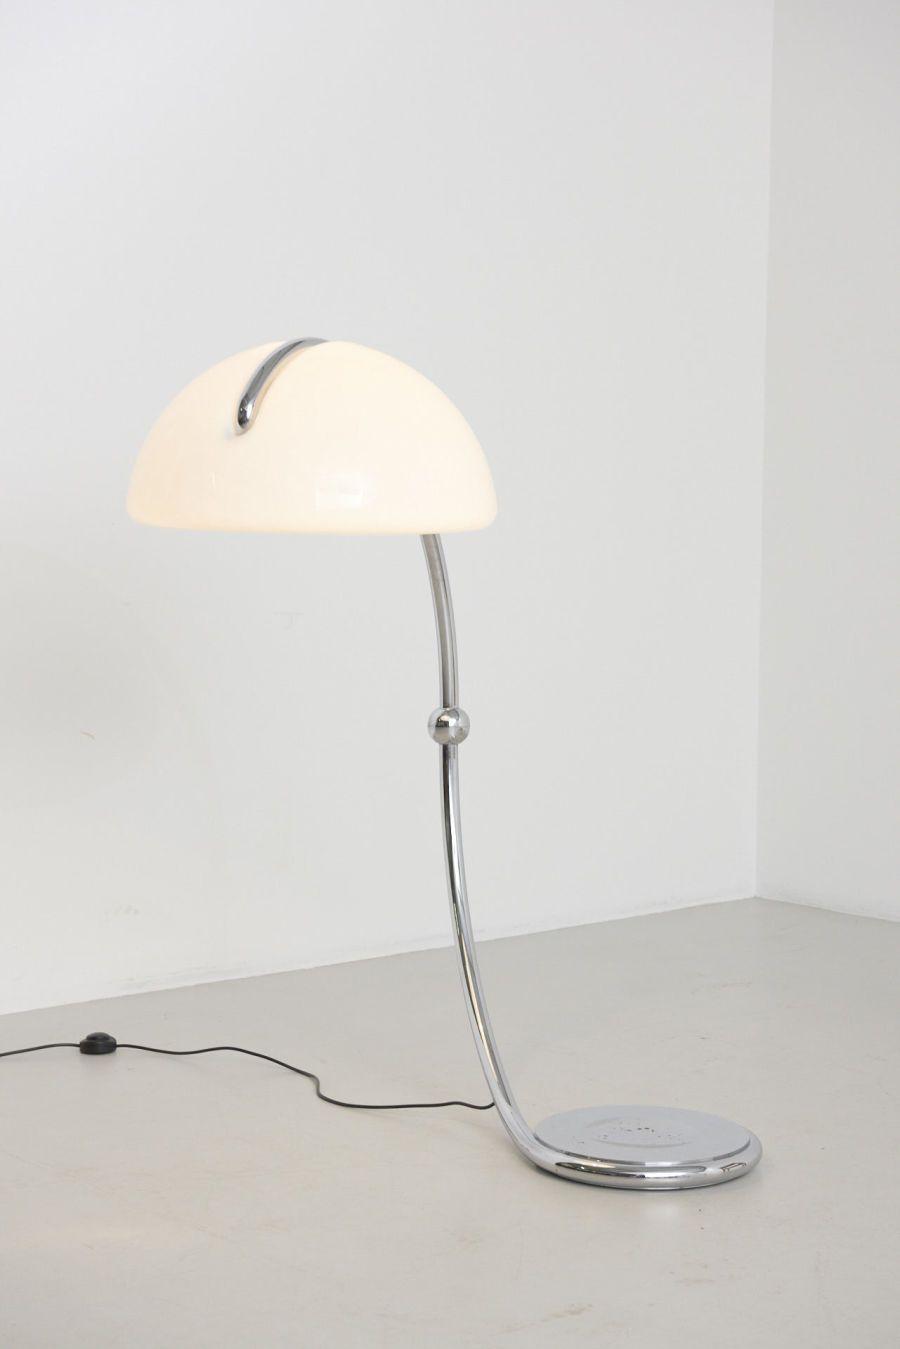 Elio Martinelli Serpente 2131 Oluce Italy 1965 In 2020 Italian Floor Lamp Floor Lamp Lamp